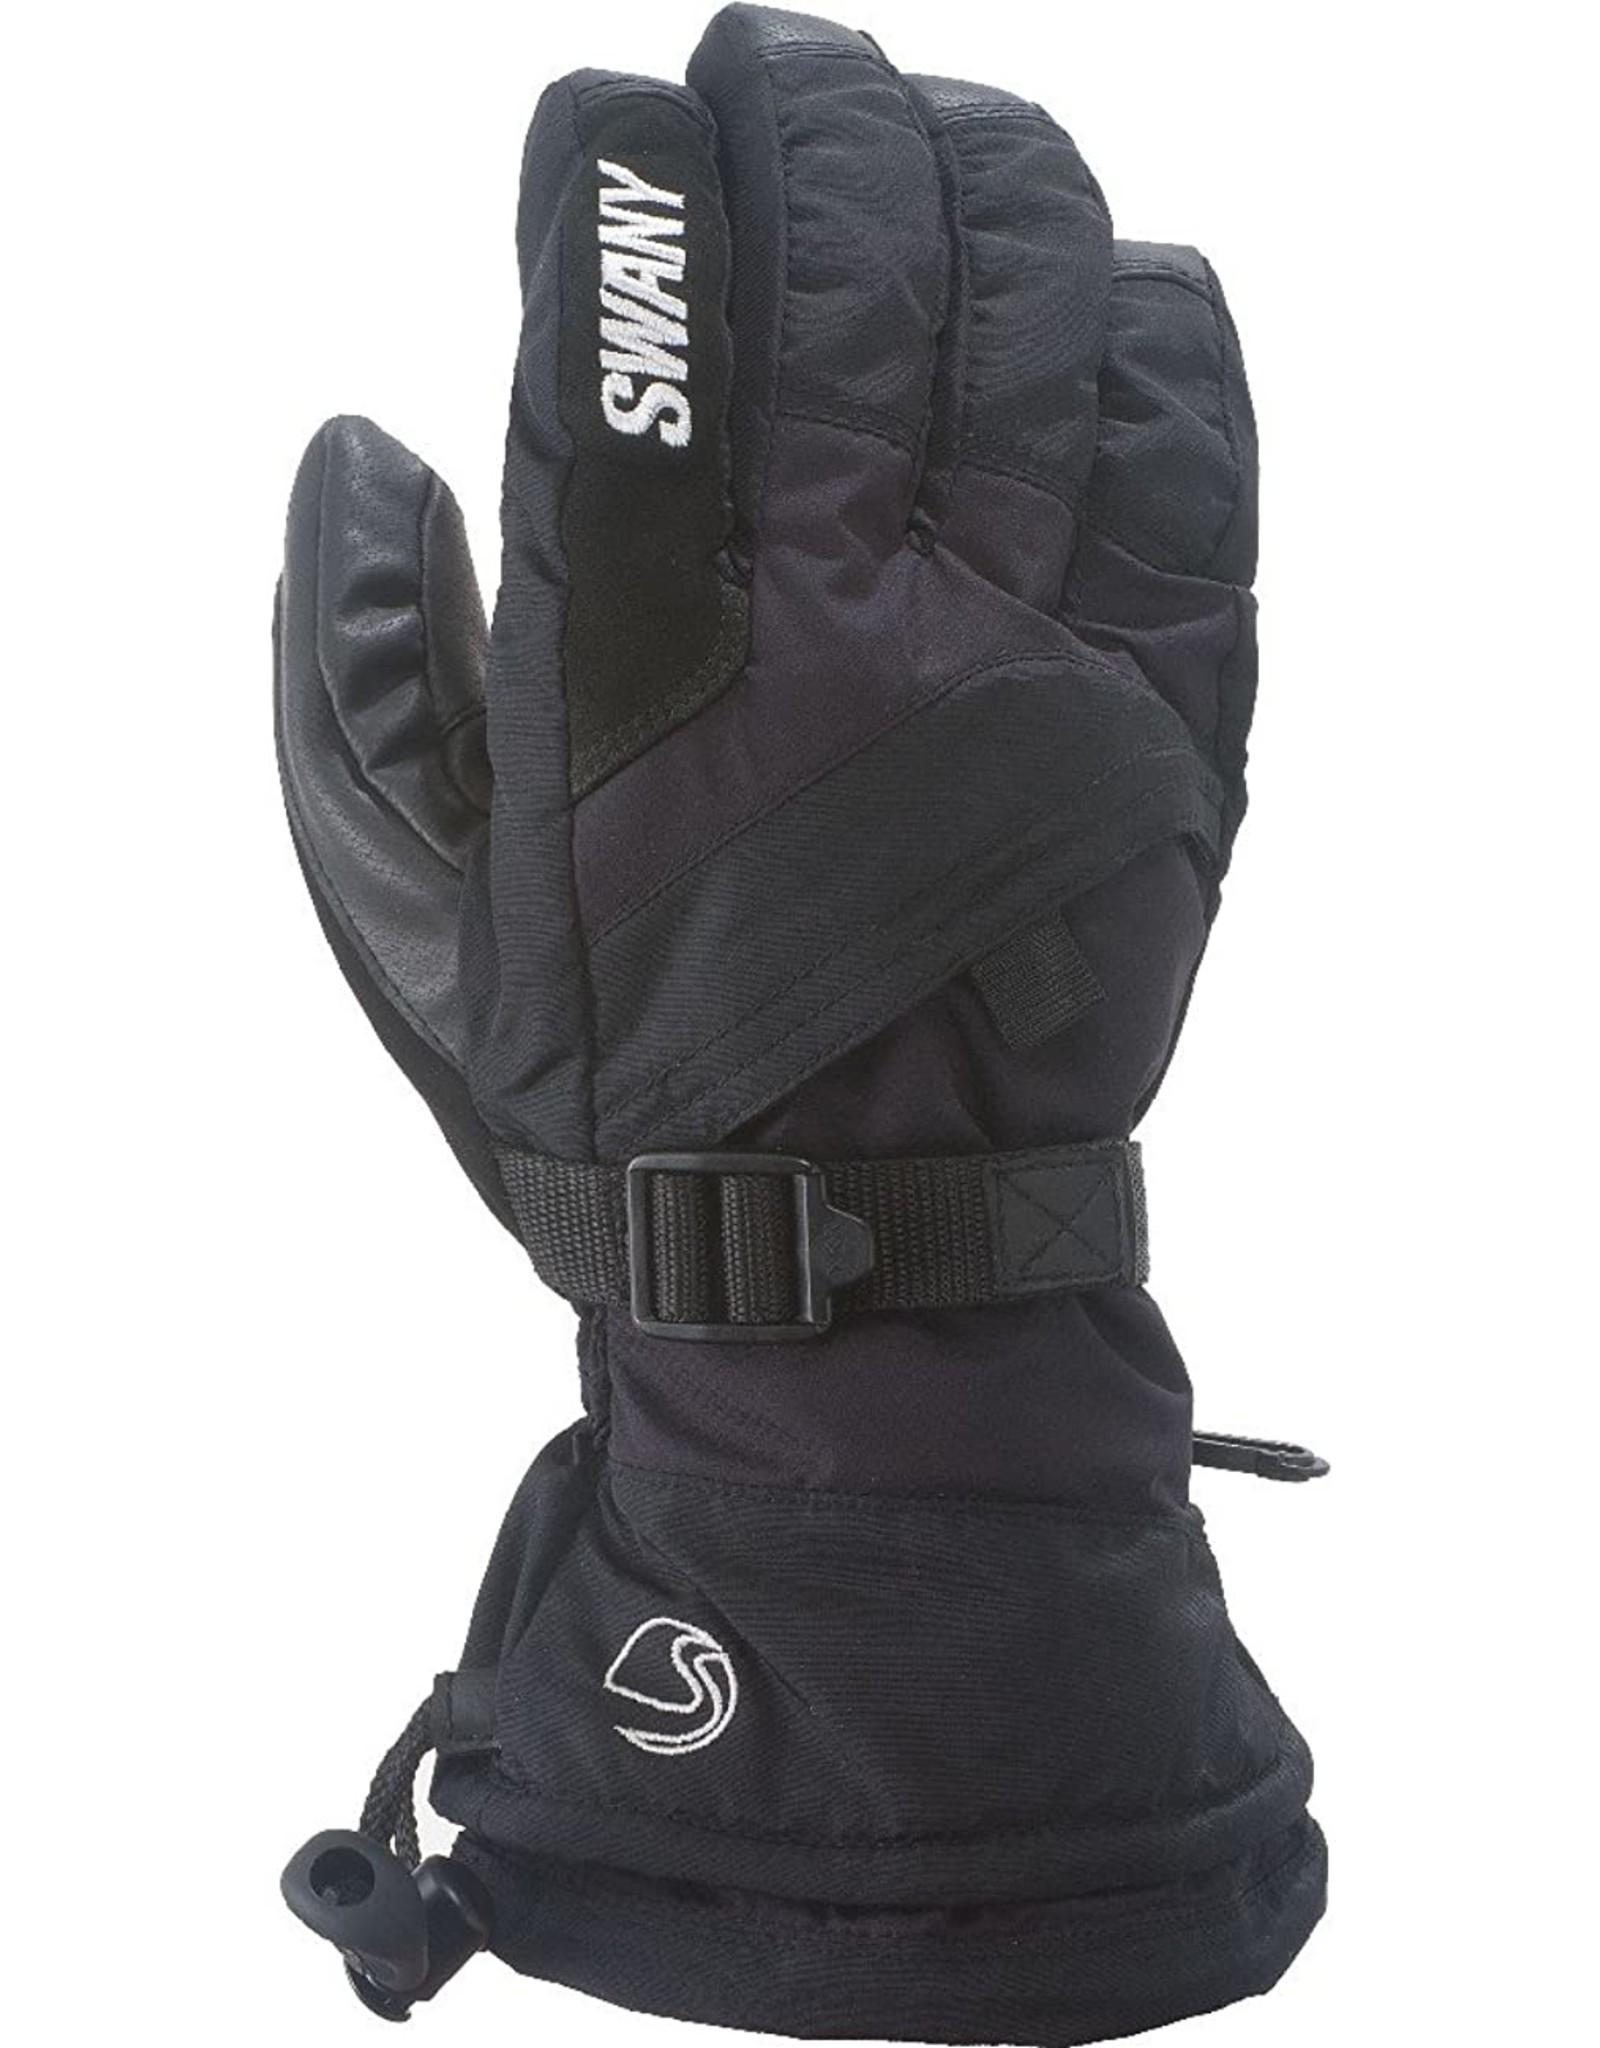 Swany Swany Women's X-Over Glove